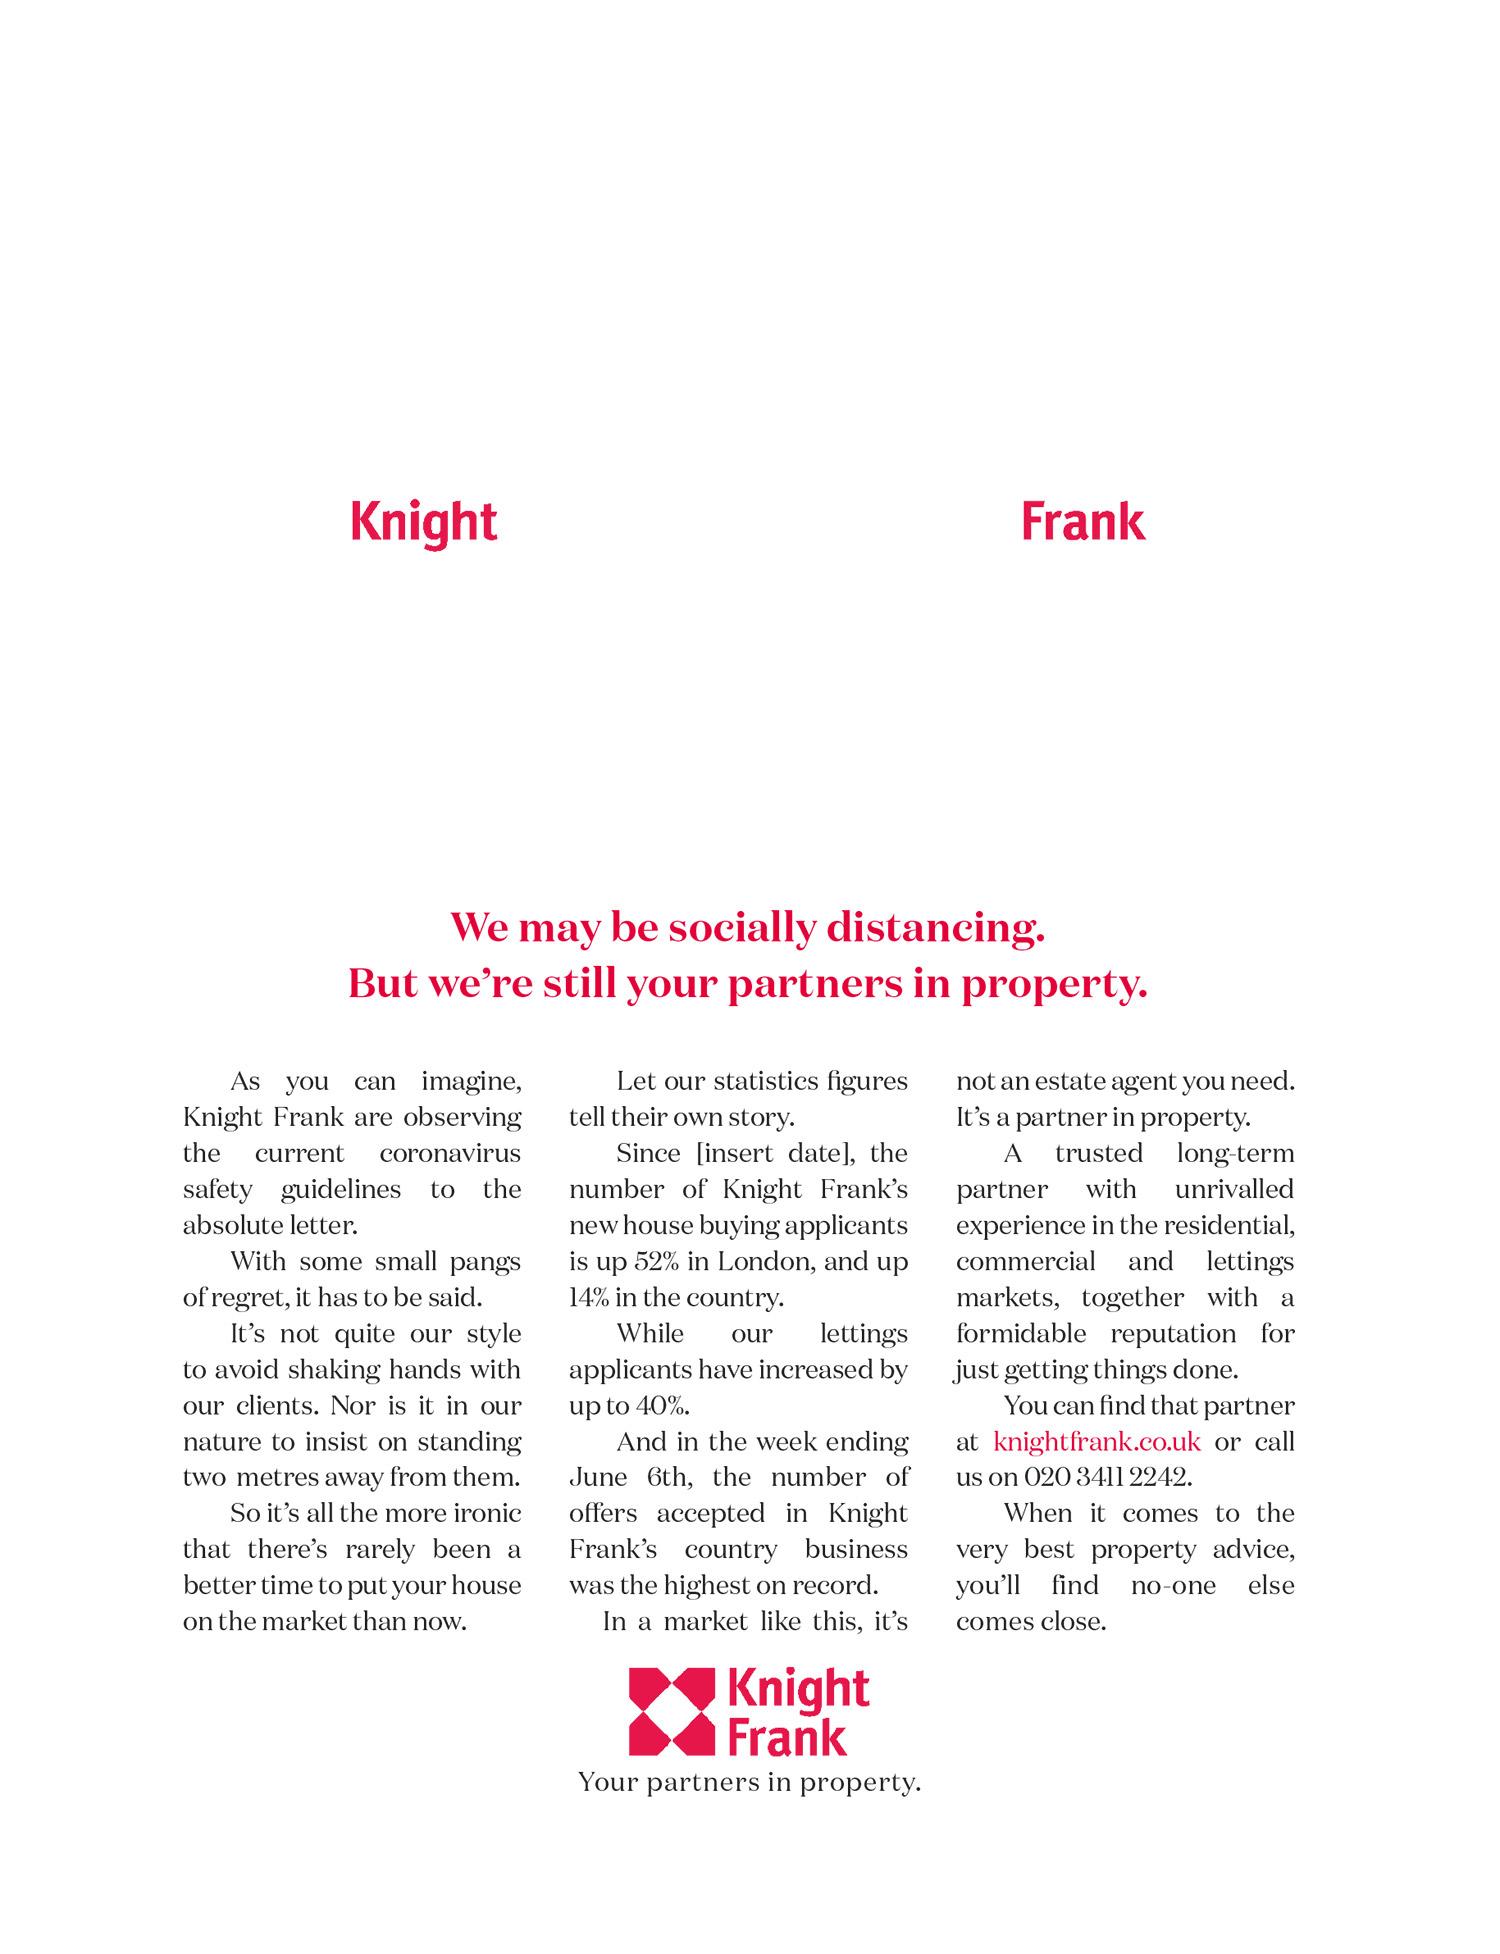 Knight Frank Social distancing